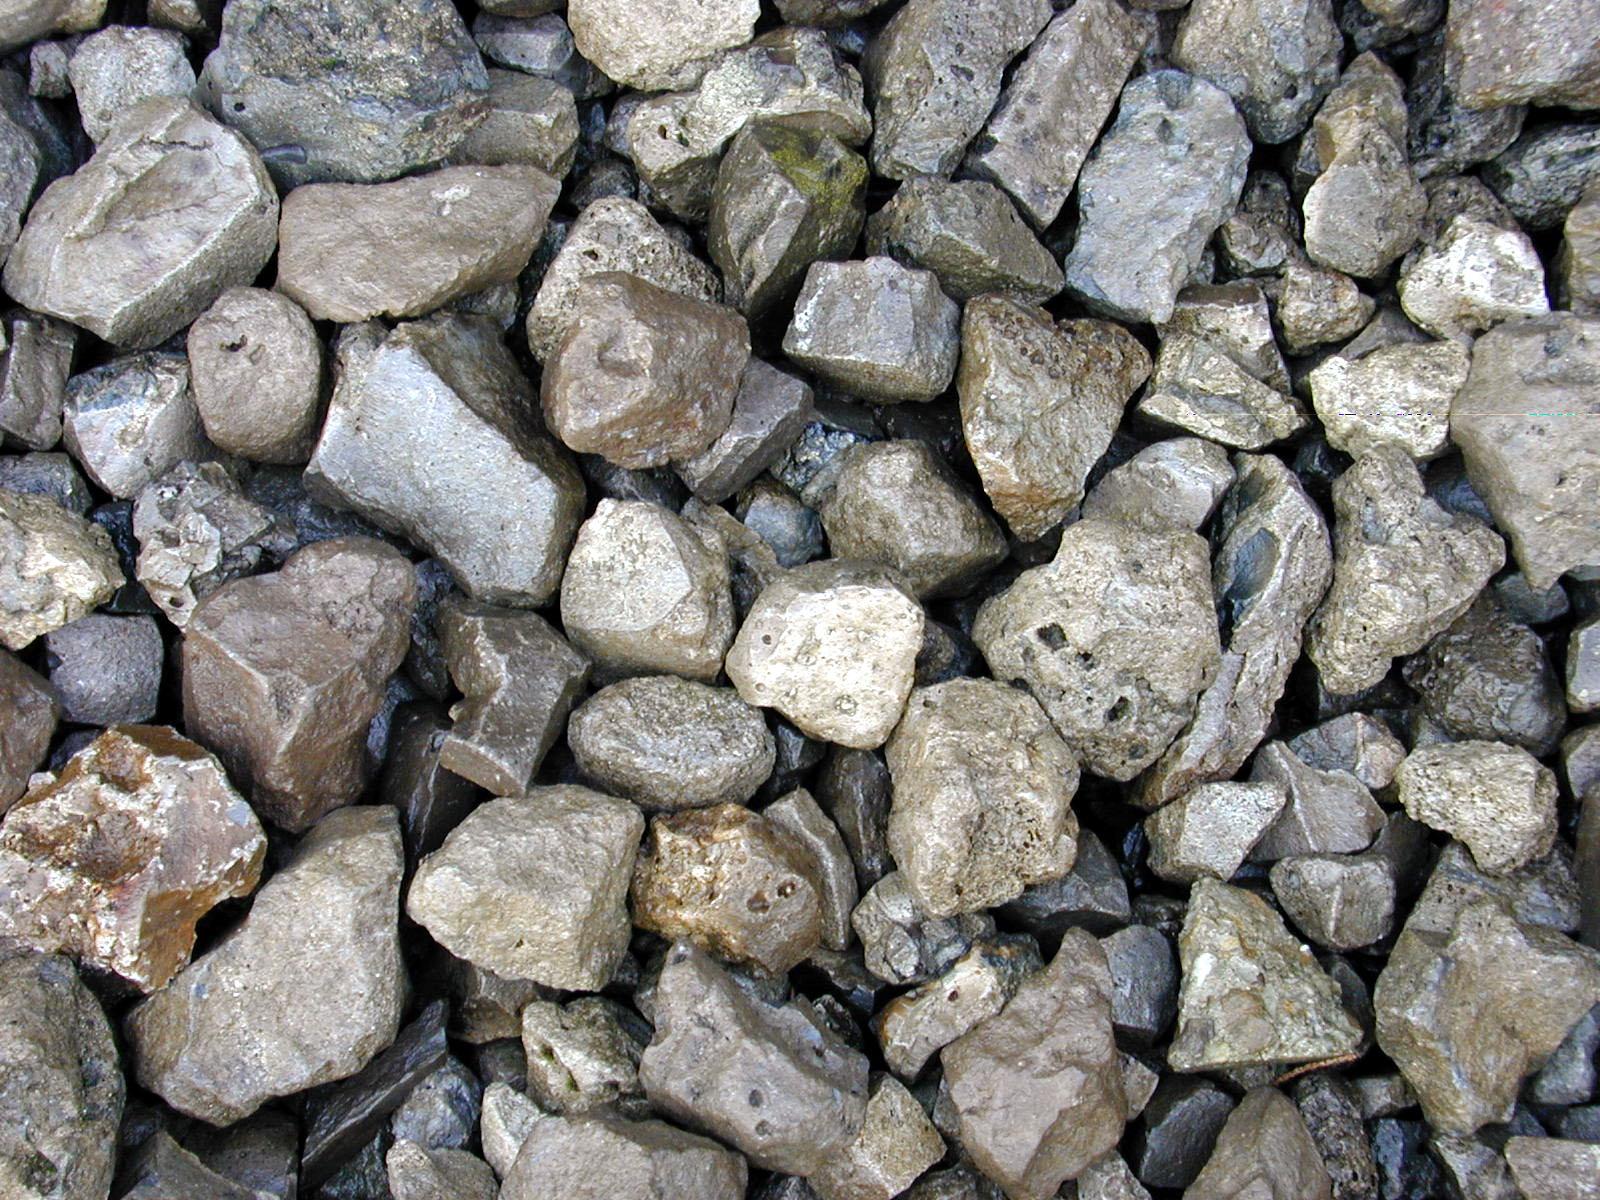 image after texture stone stones pile piled rock rocks. Black Bedroom Furniture Sets. Home Design Ideas